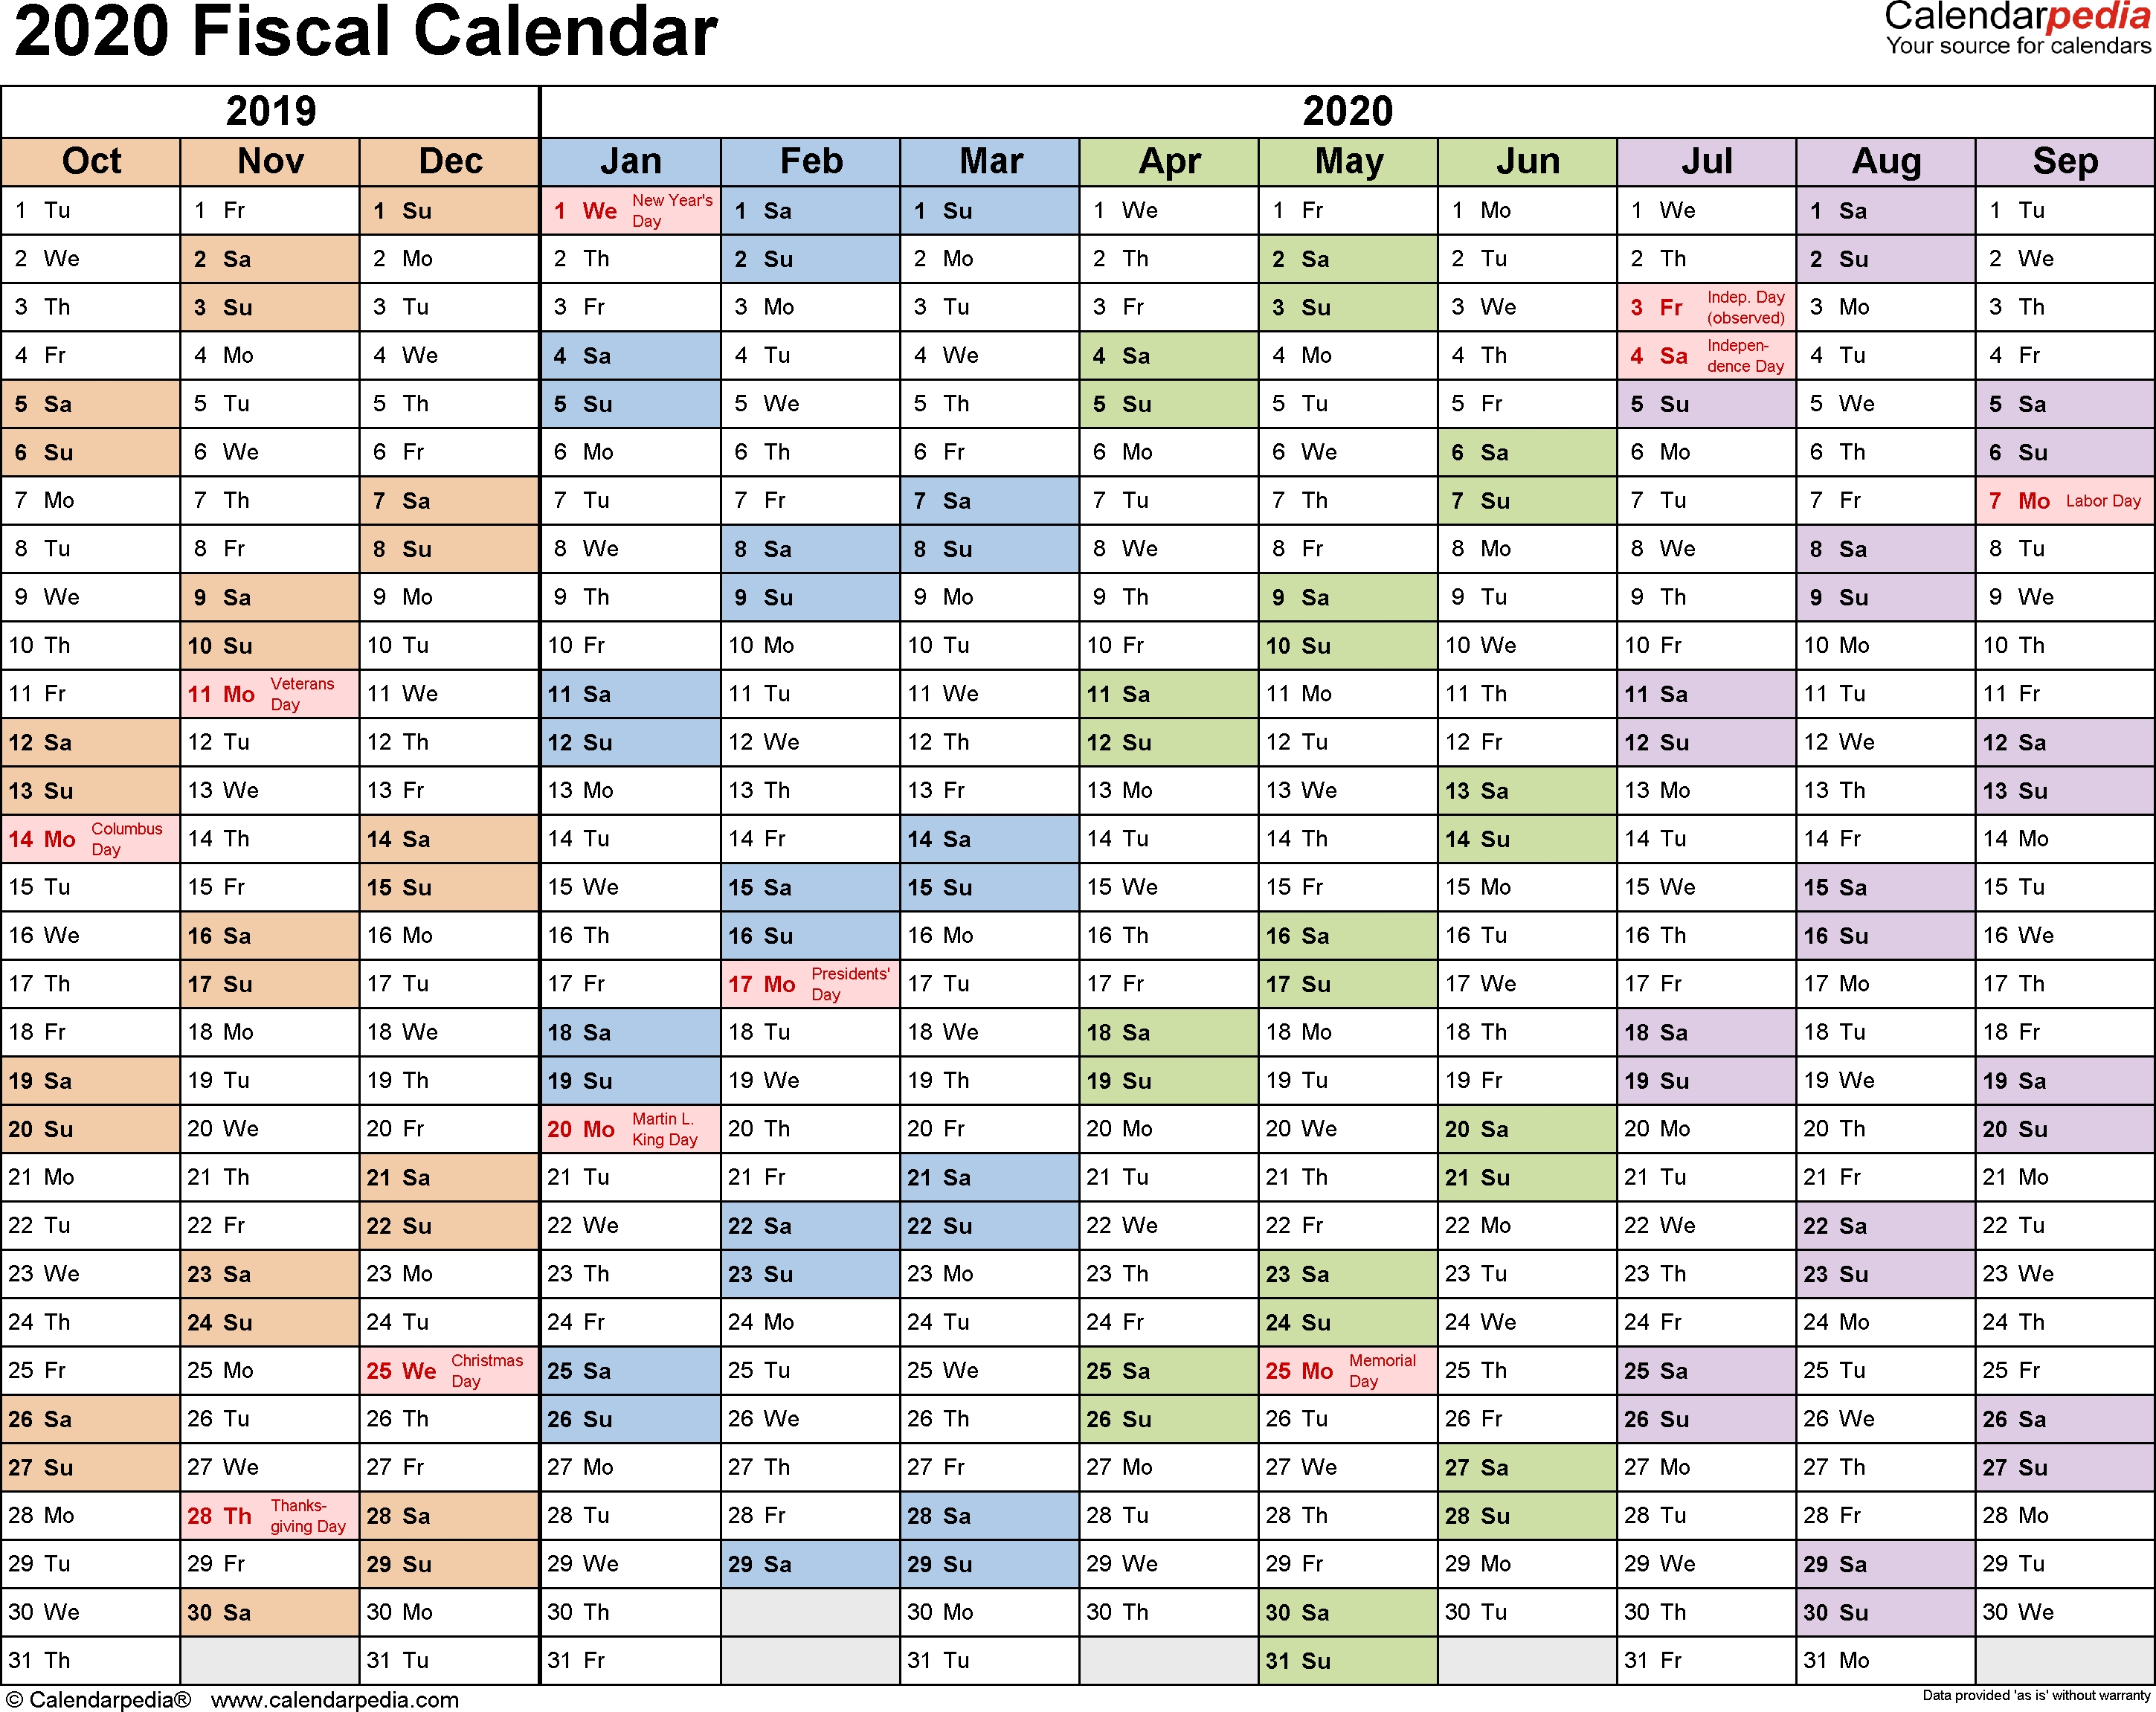 Fiscal Calendars 2020 - Free Printable Word Templates inside 2019 Fiscal Calendar 4 4 5